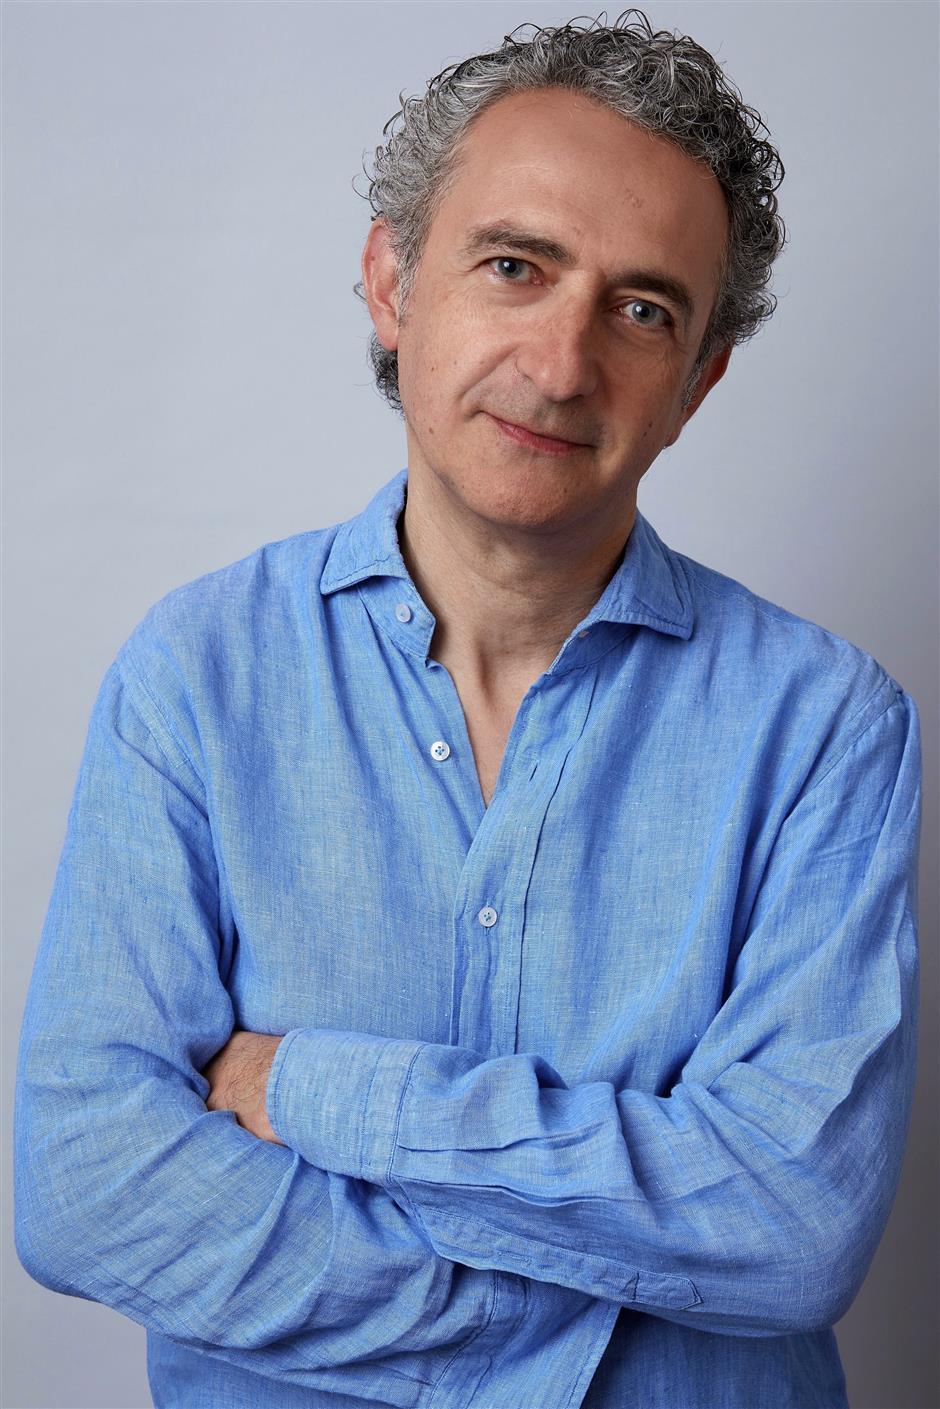 Simon Garfield: In Miniature